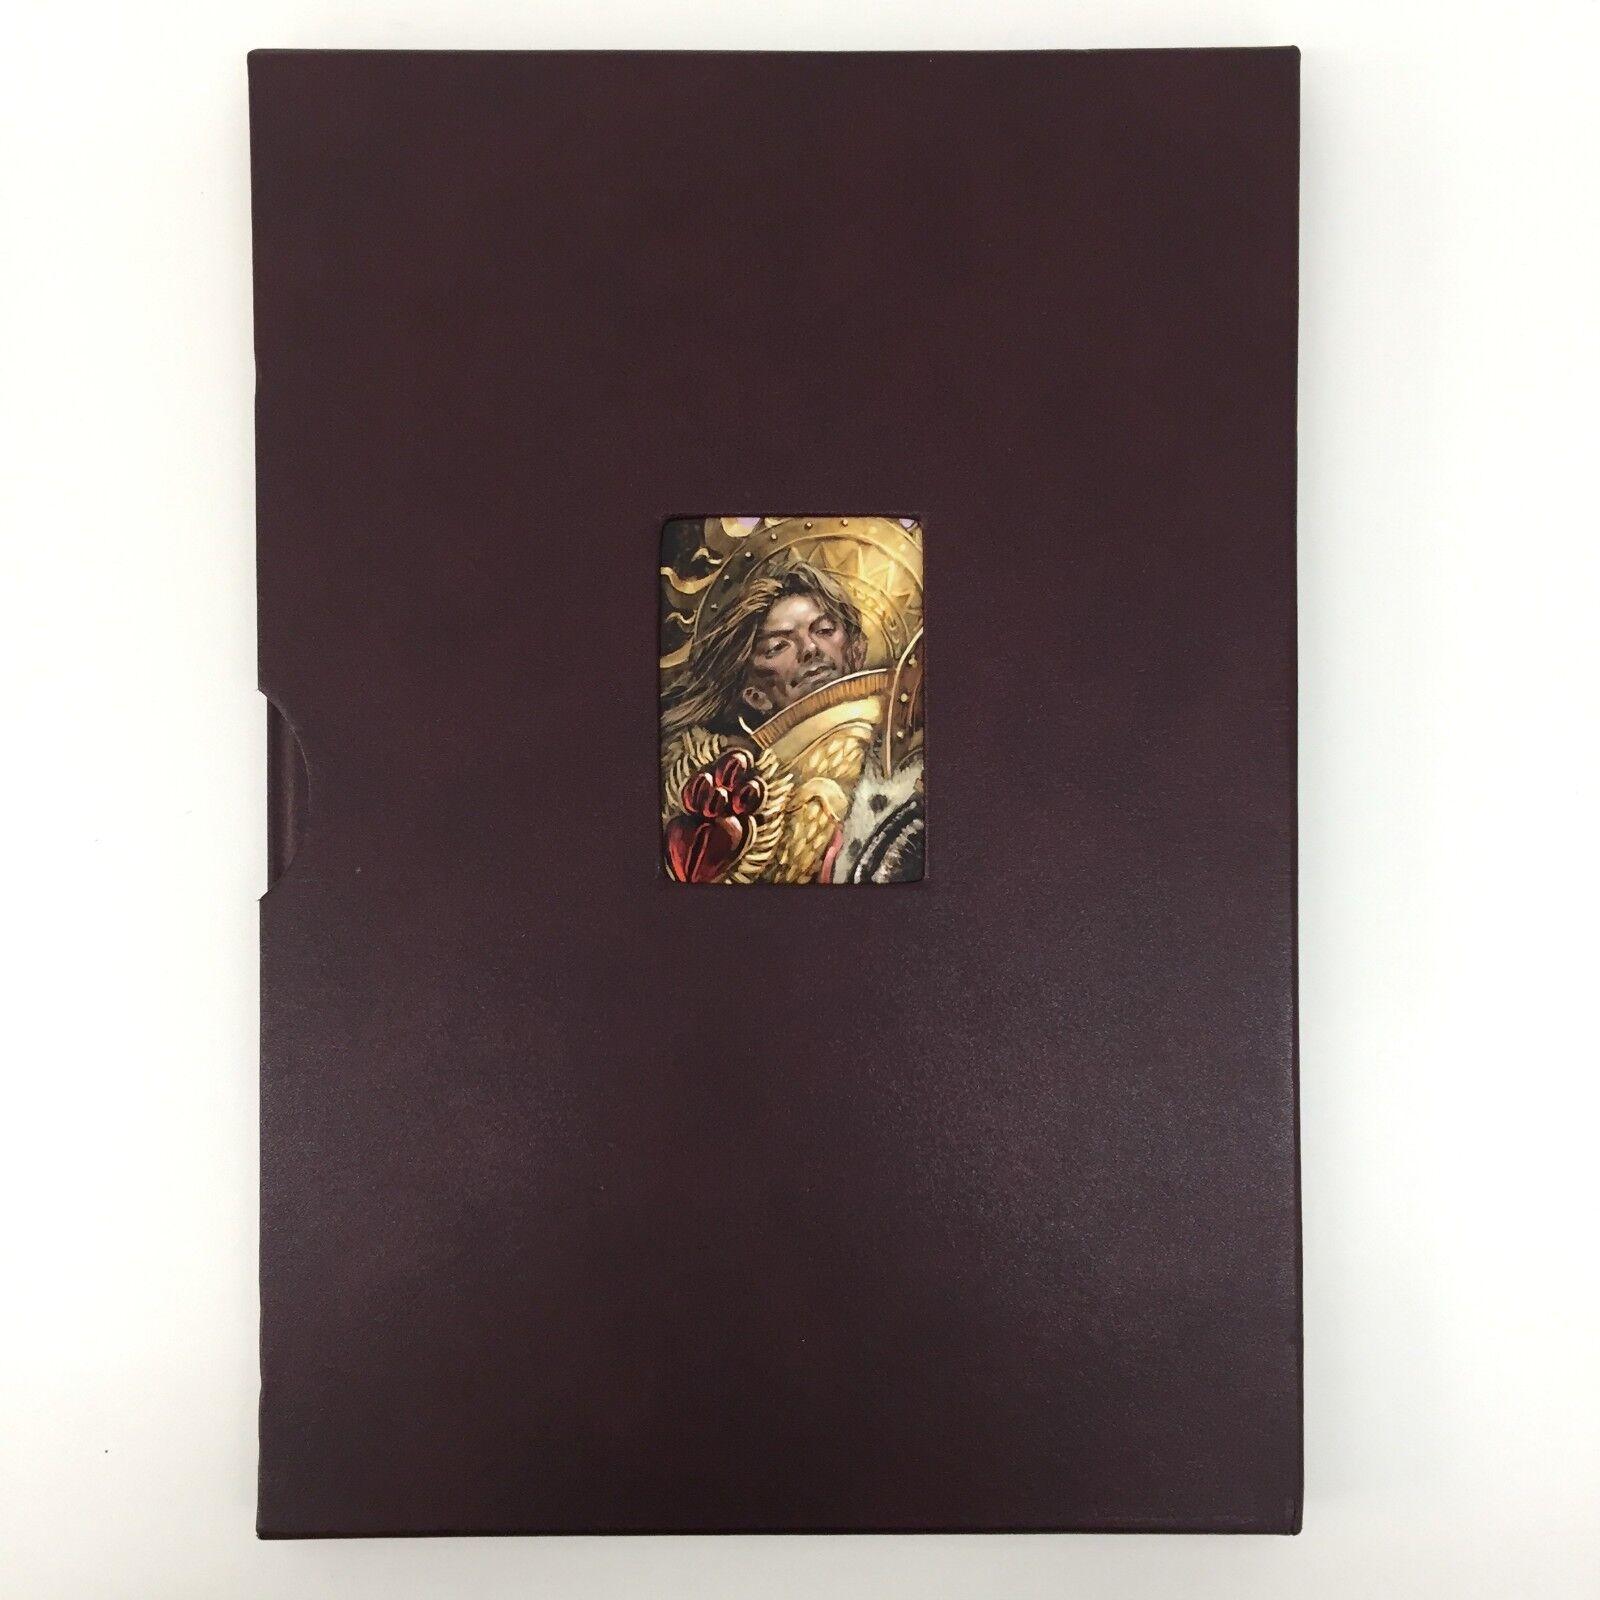 THE HORUS HERESY VOL 3 VISIONS OF TREACHERY III LIMITED EDITION 188 300 (2005)